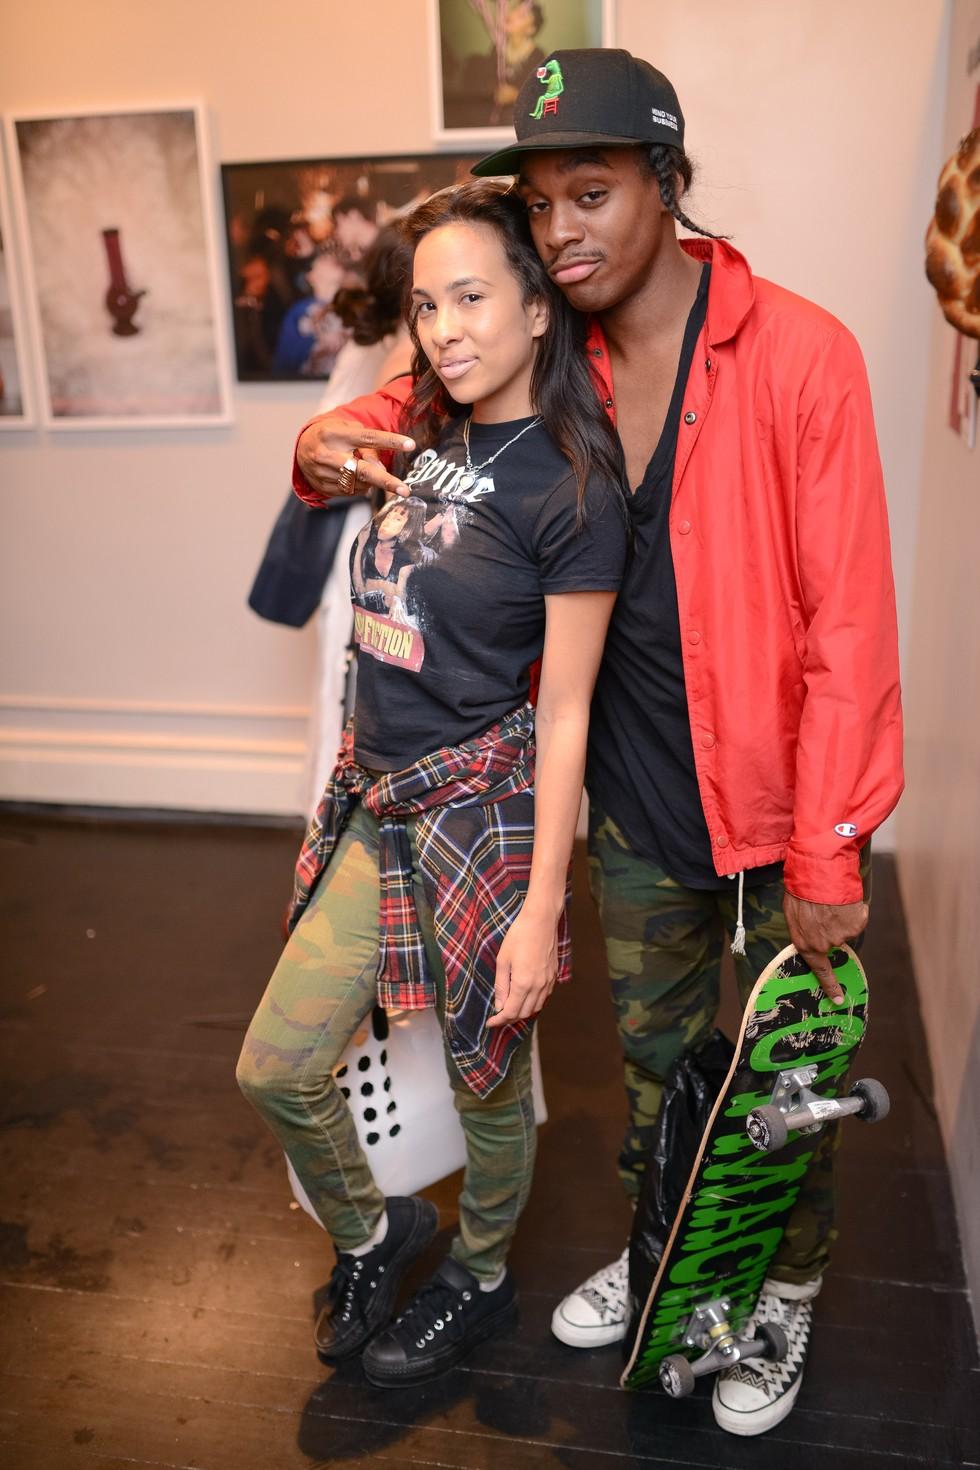 DKNY Art Show